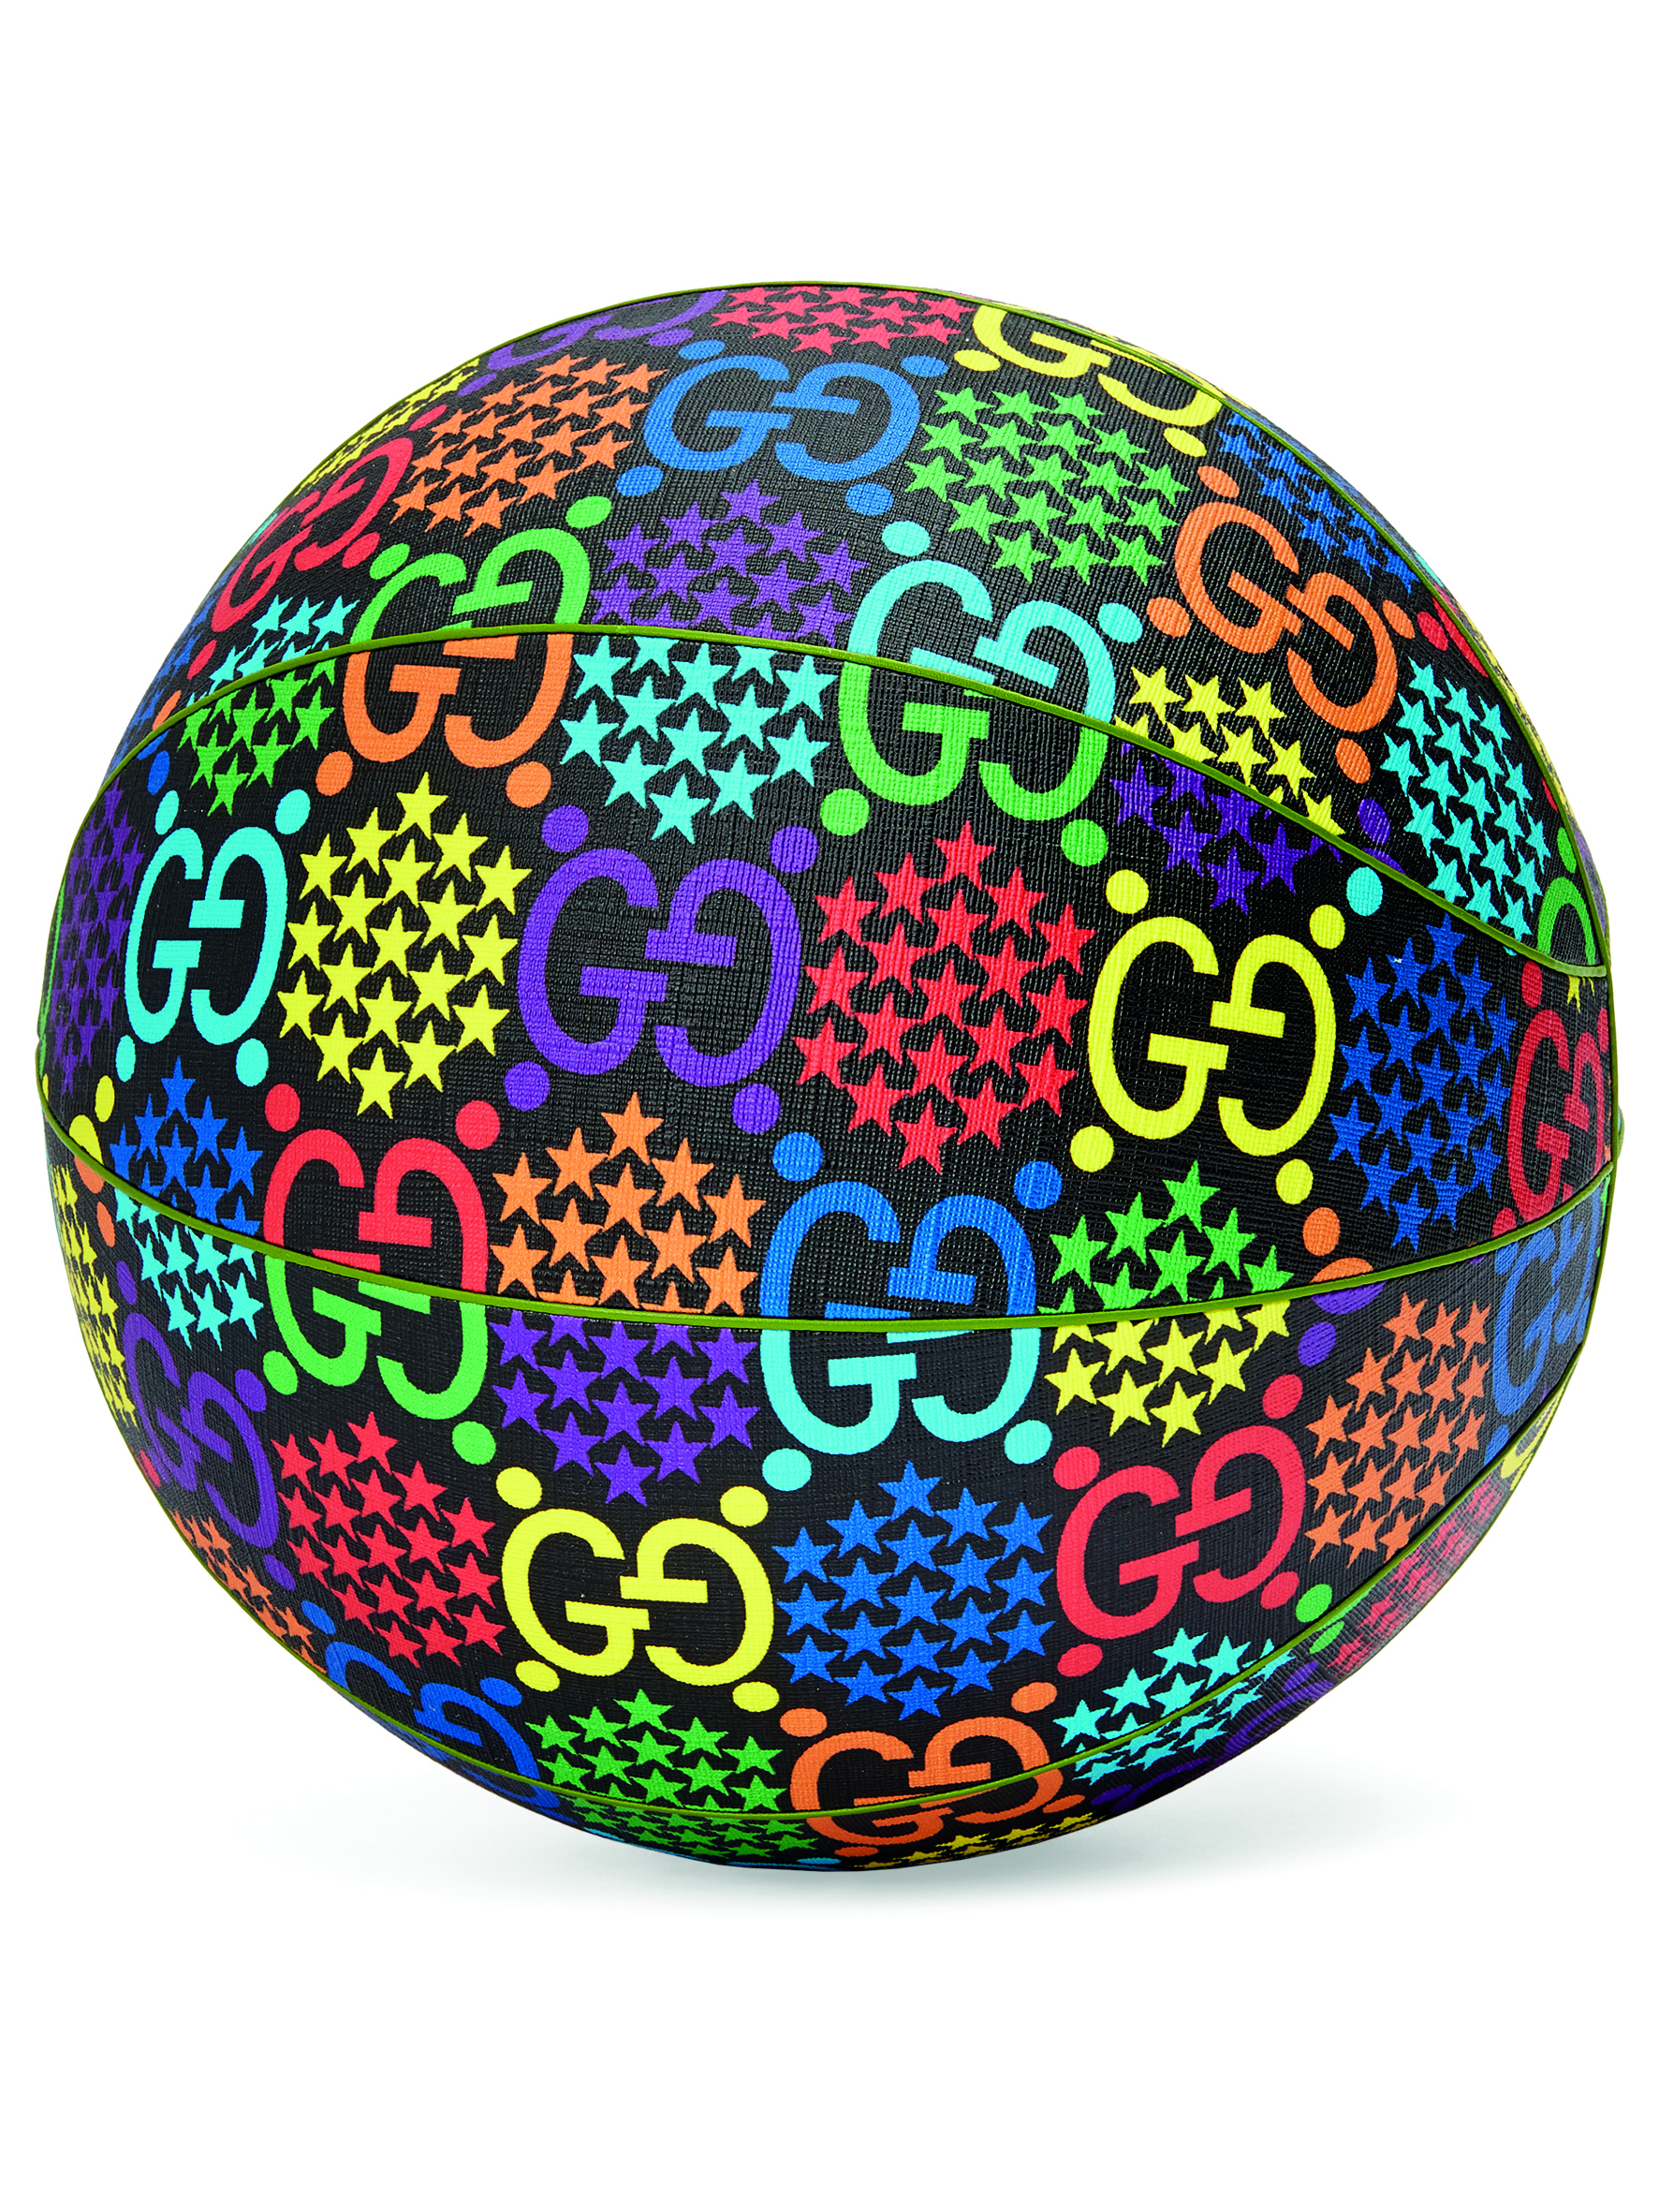 Gucci basketball